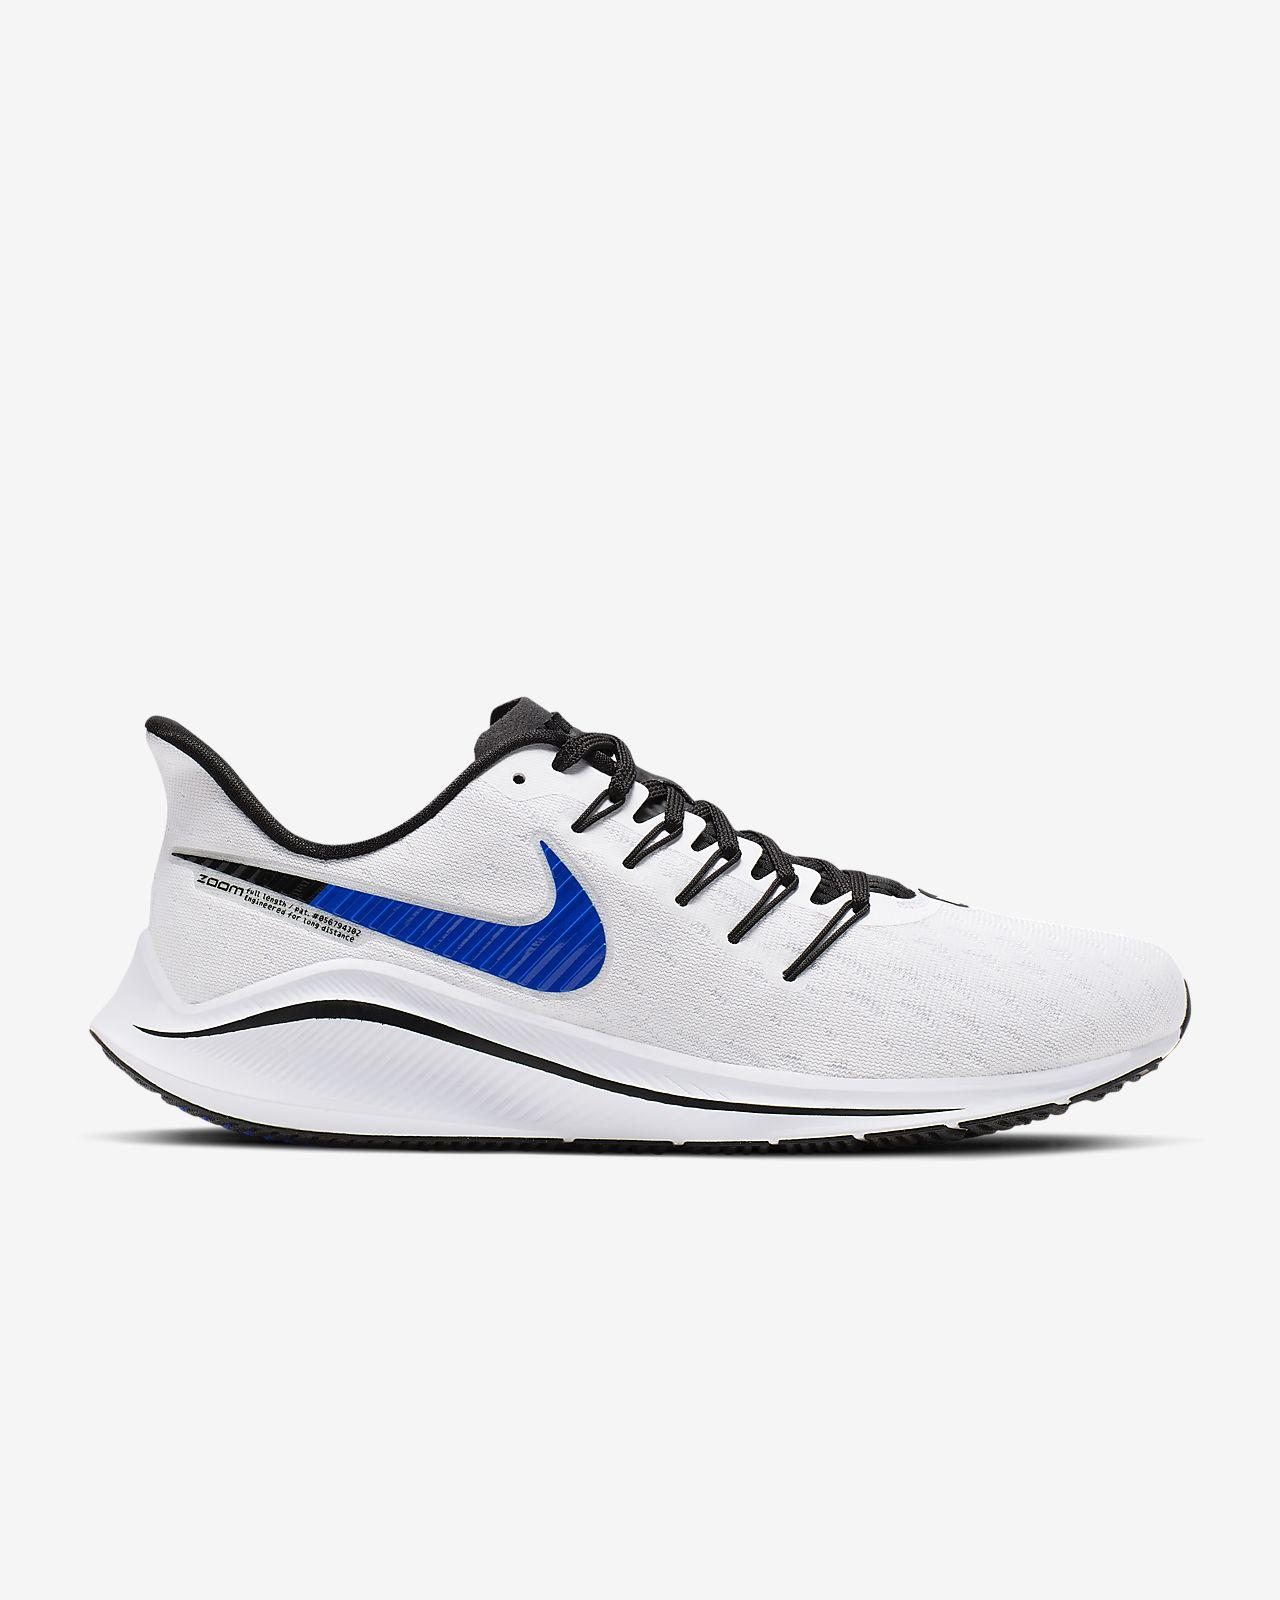 Toutes Les Nike Basket 2018 Homme, Chaussure Nike Vomero 8